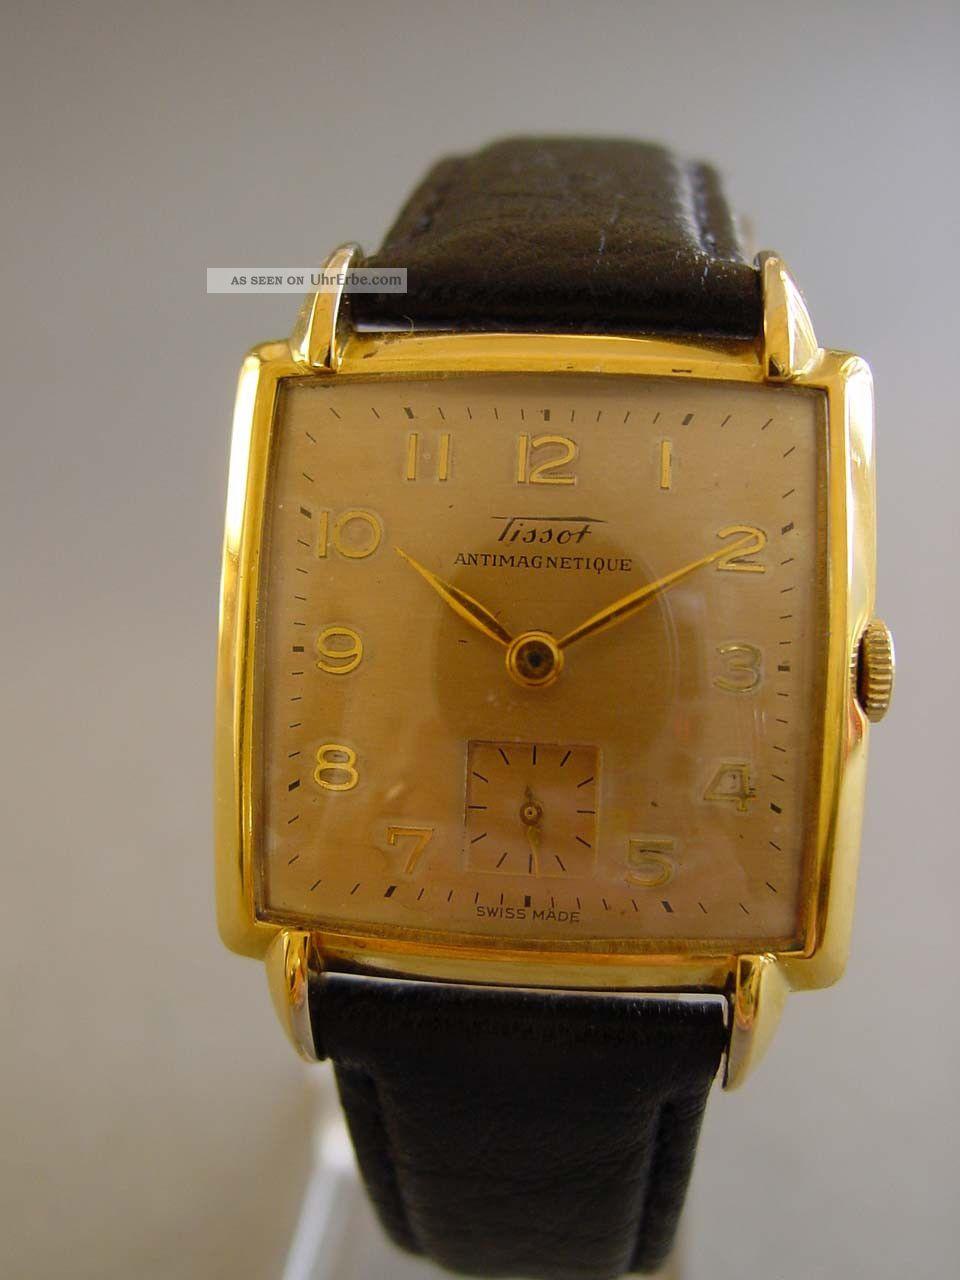 Tissot Handaufzug CarreegehÄuse,  Ca.  1940,  Läuft,  Formwerk? Armbanduhren Bild